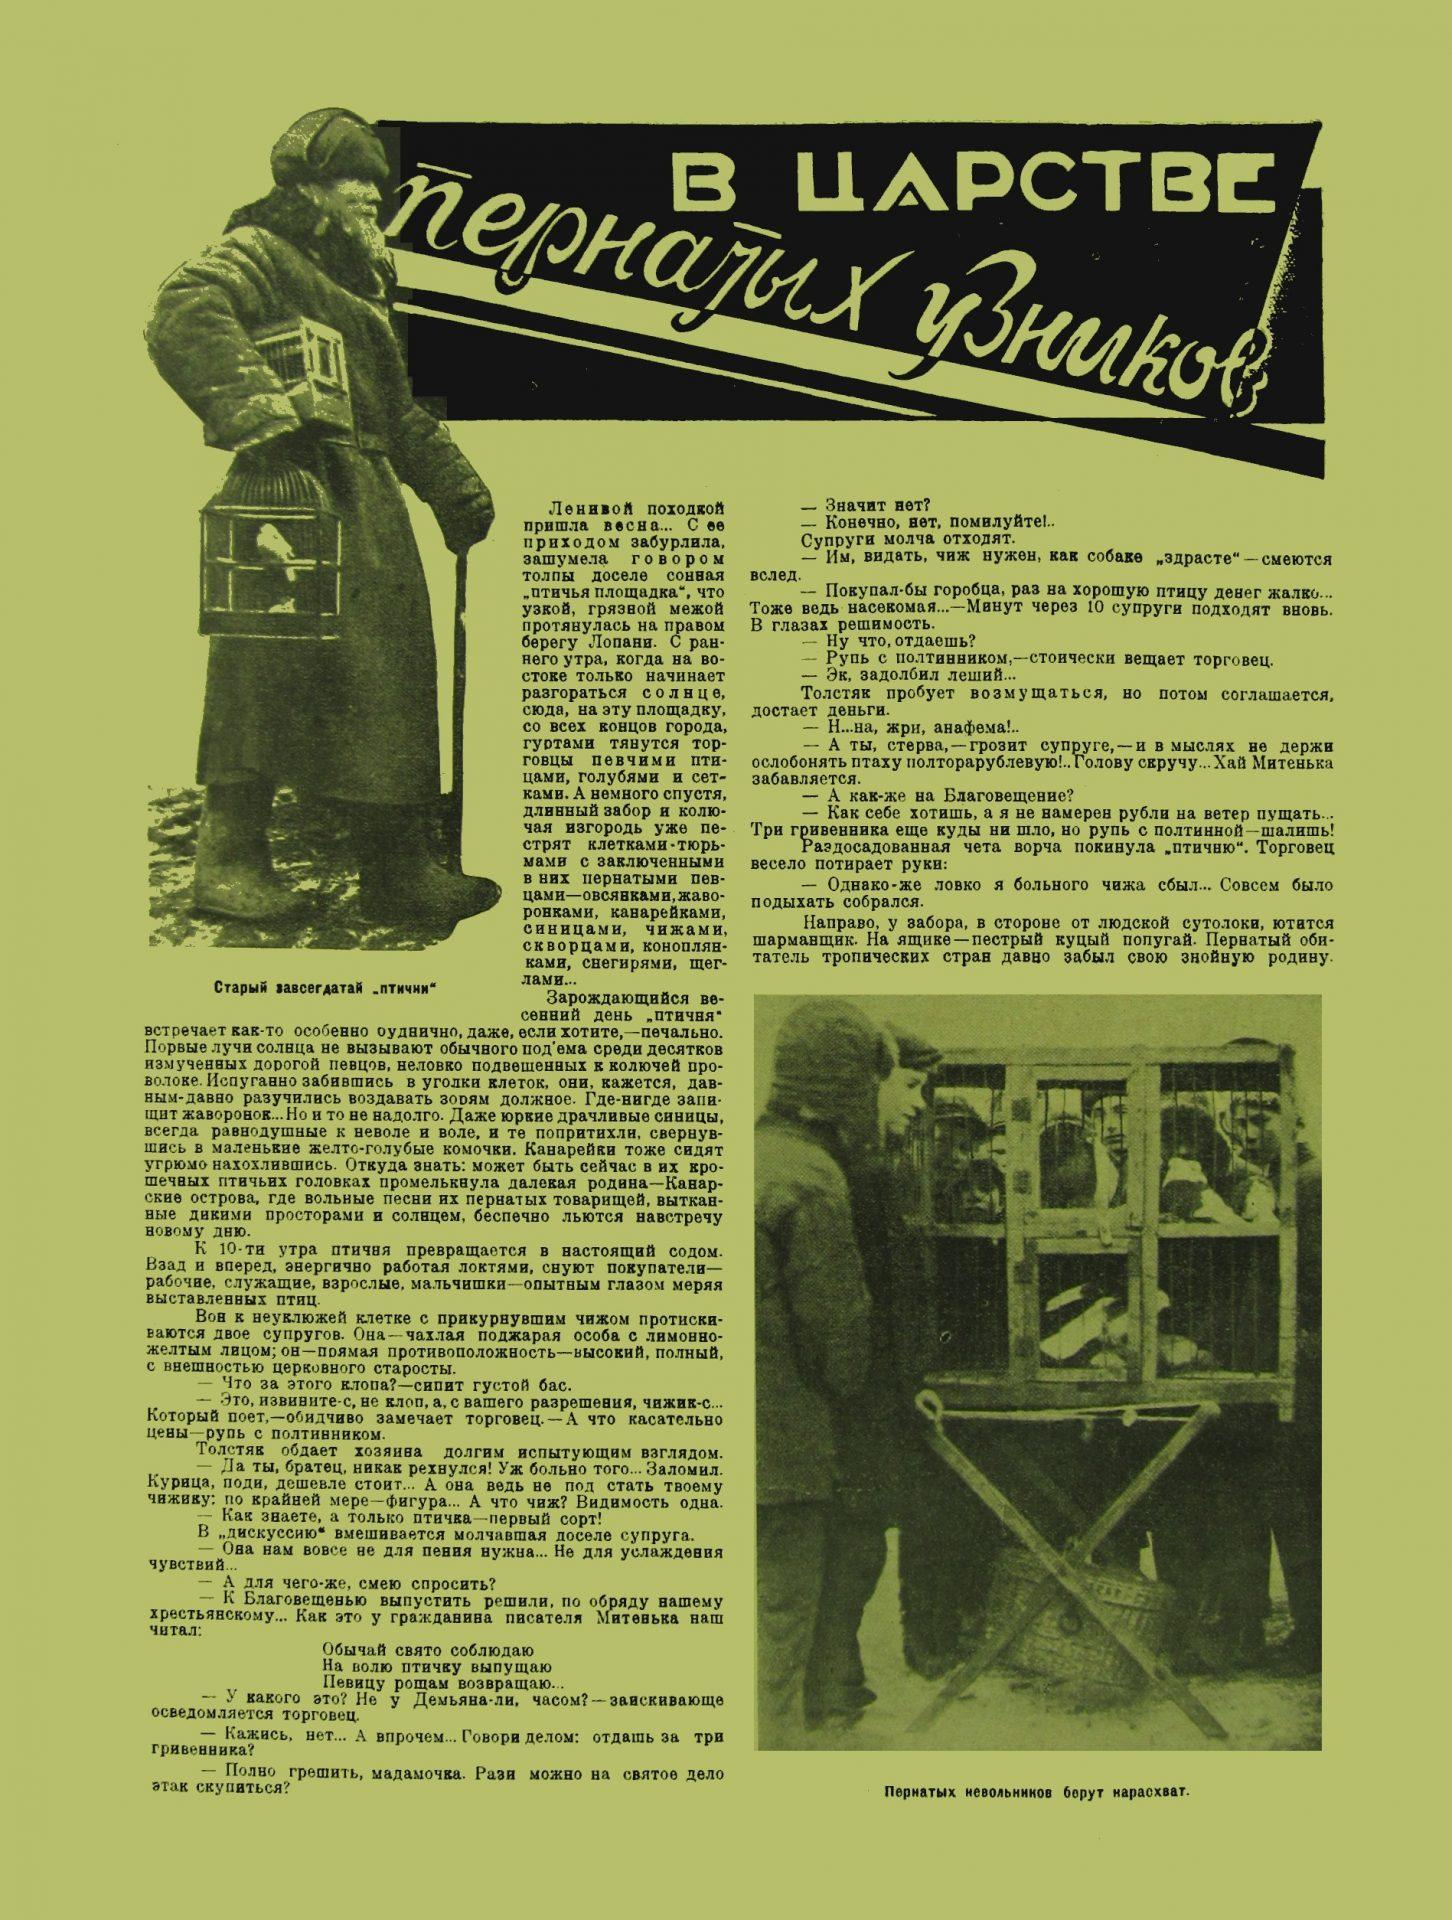 Пламя_1926_№ 7